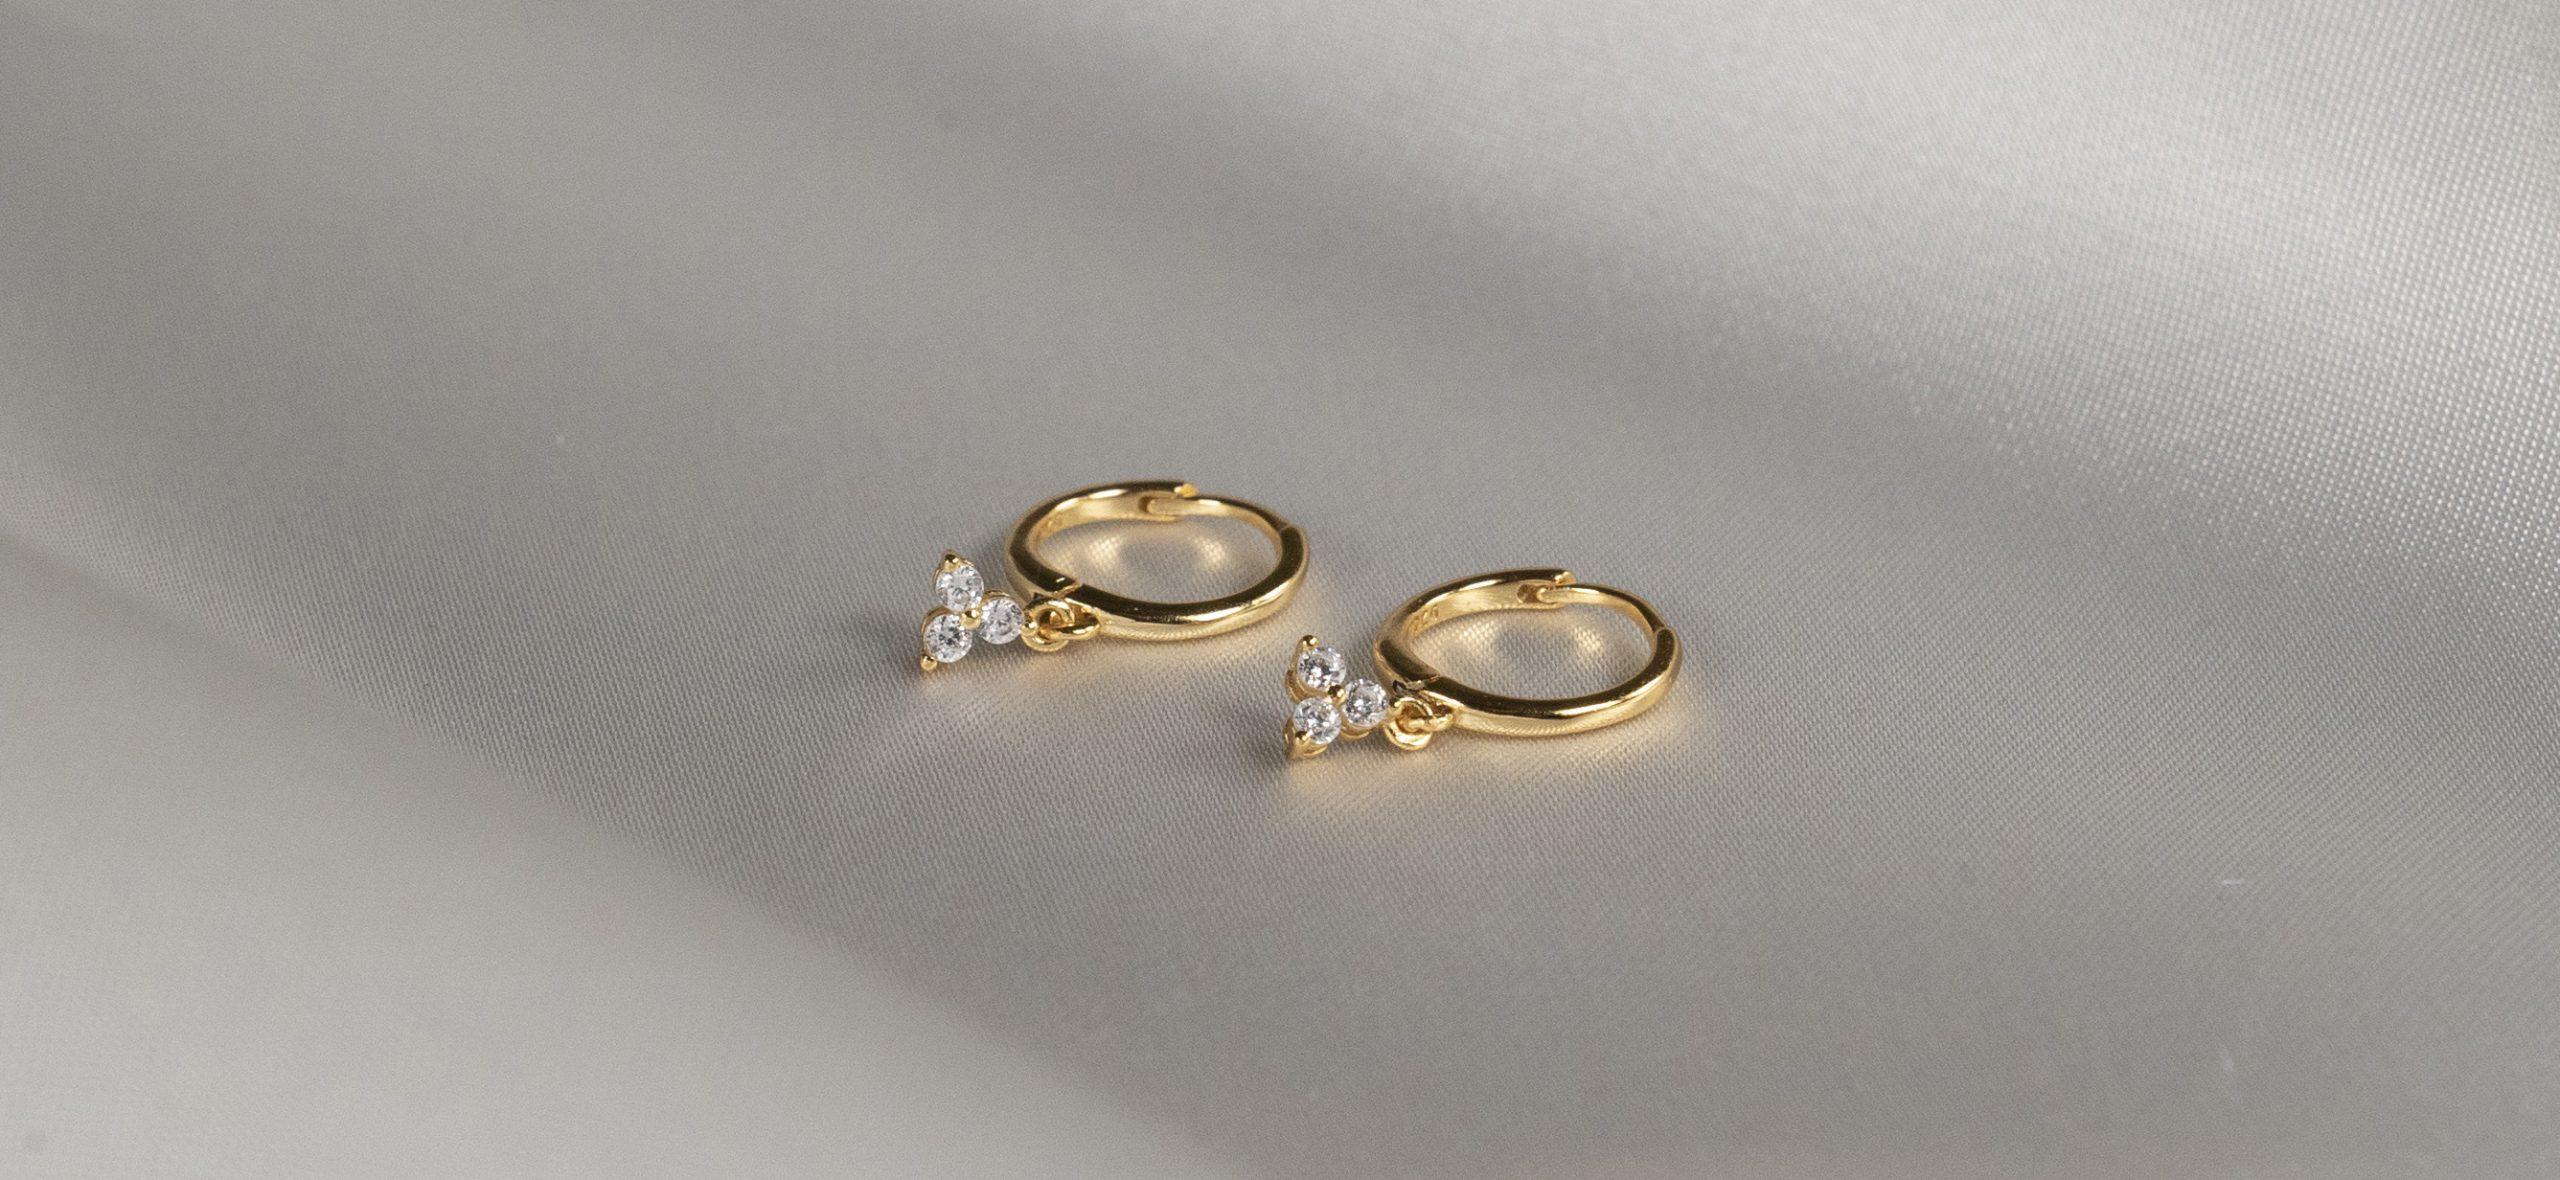 Gold Plated Hoop with Trigem Piercings - Bella Andrea Piercing Jewellery